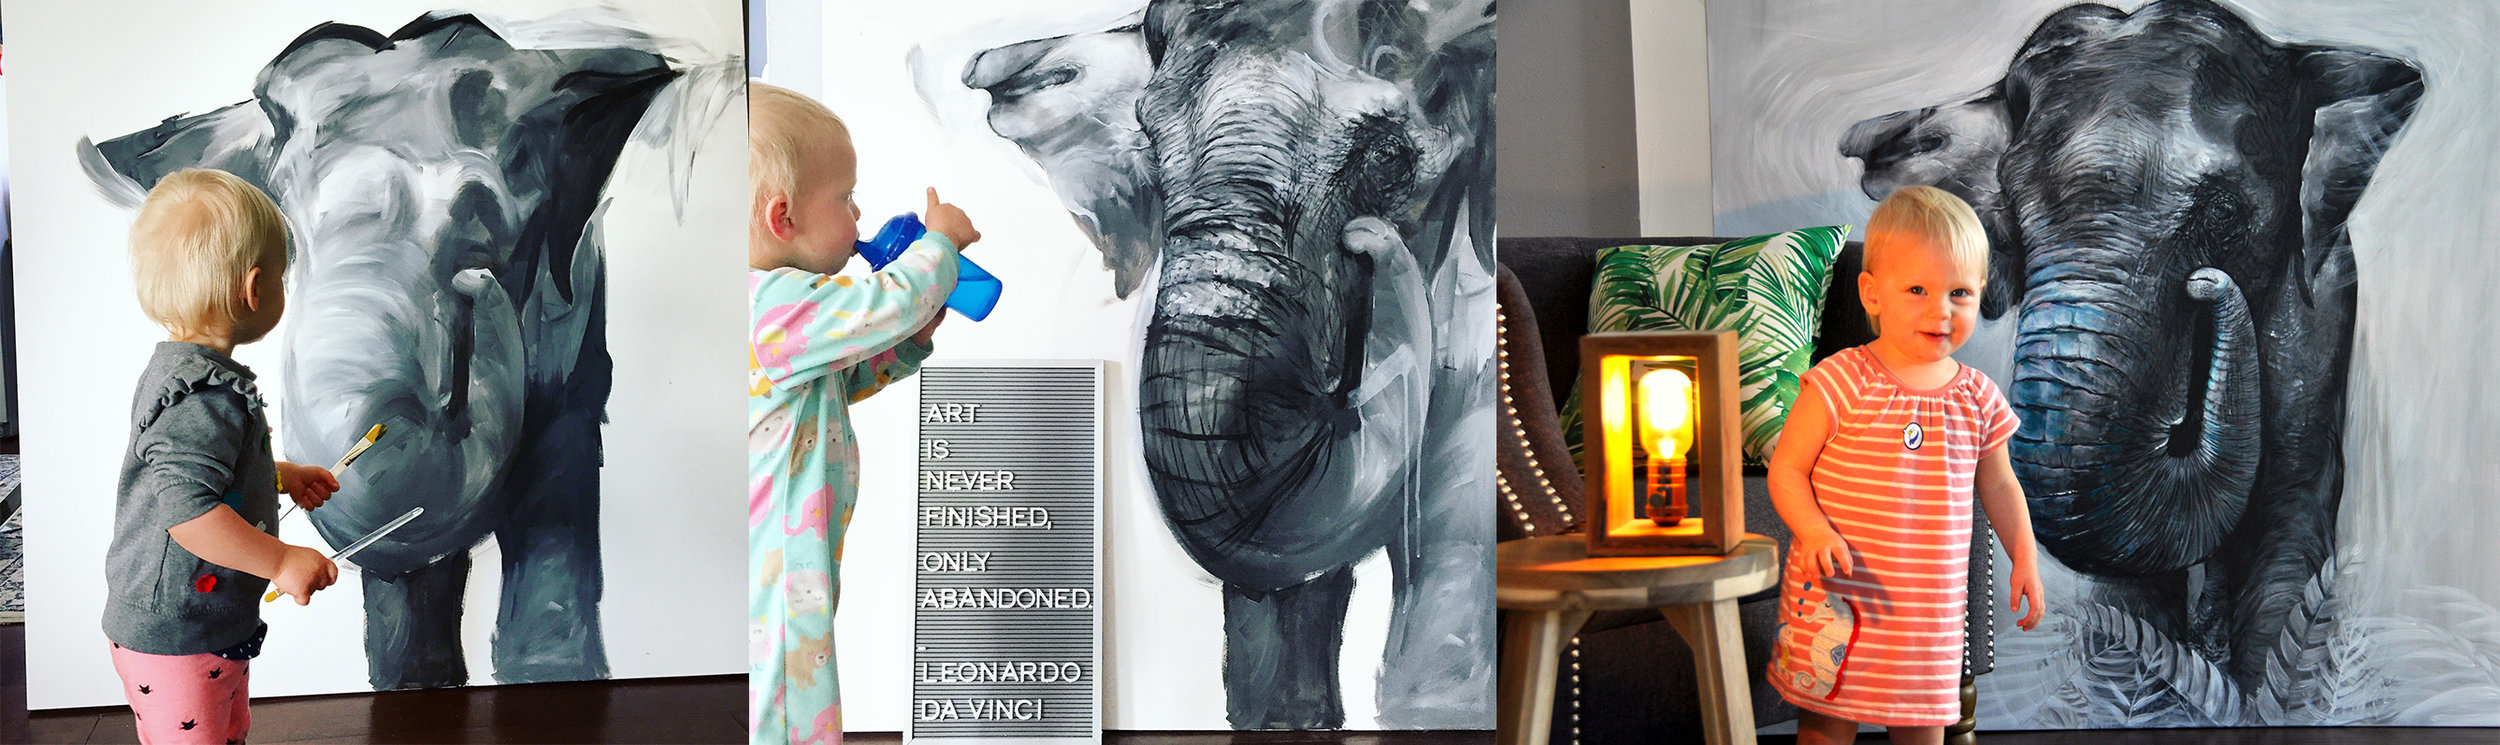 Elephantprocess.jpg